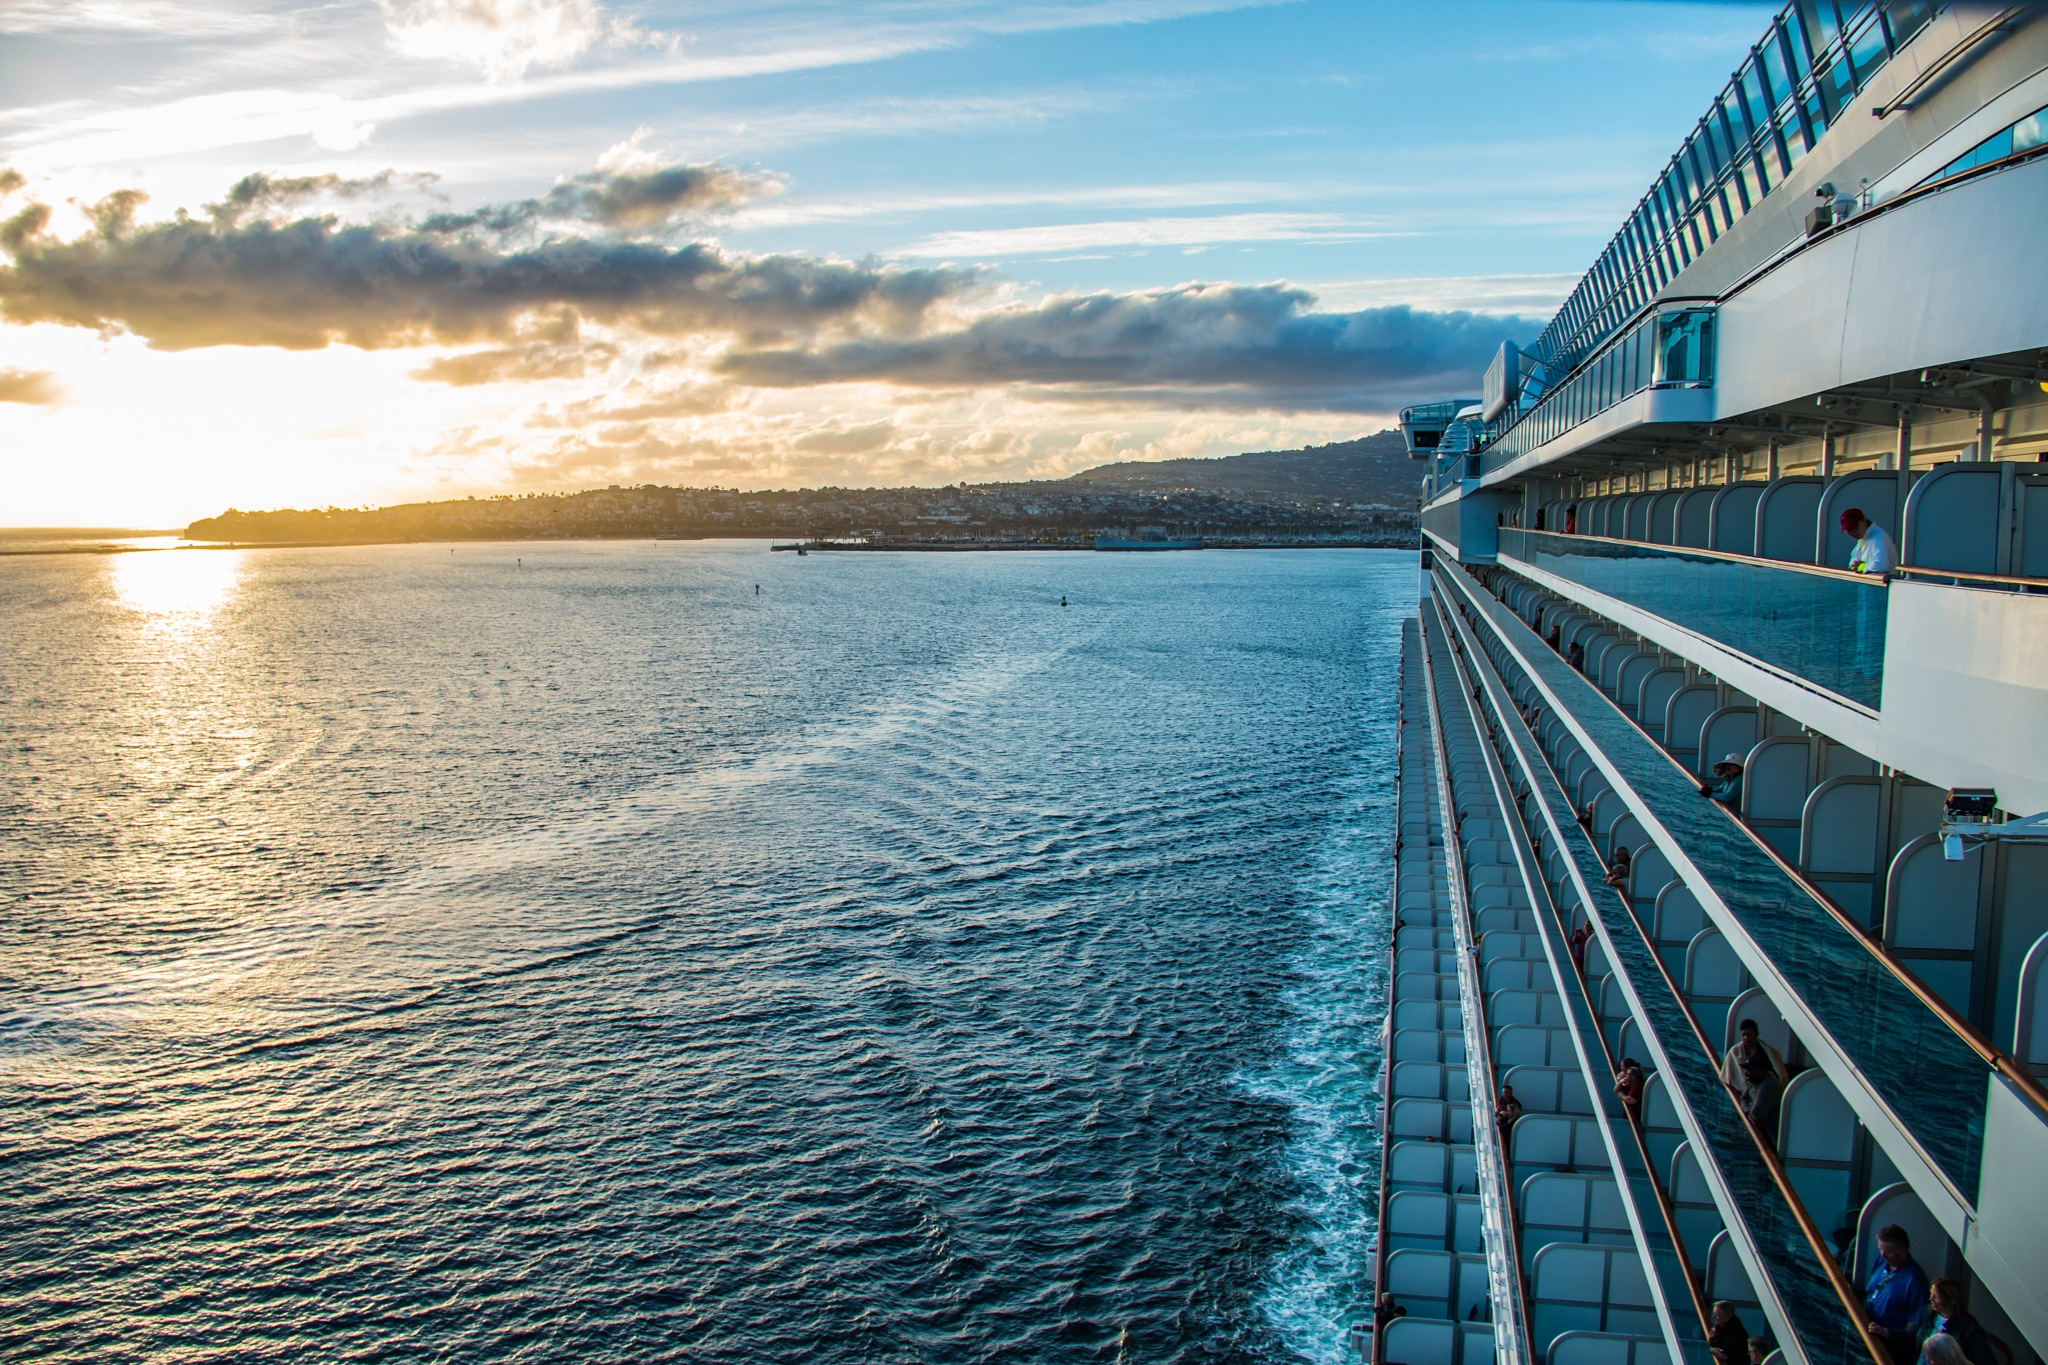 Sailing Away & Watching the Sunset by JD3Studios l Joseph DeFalco III